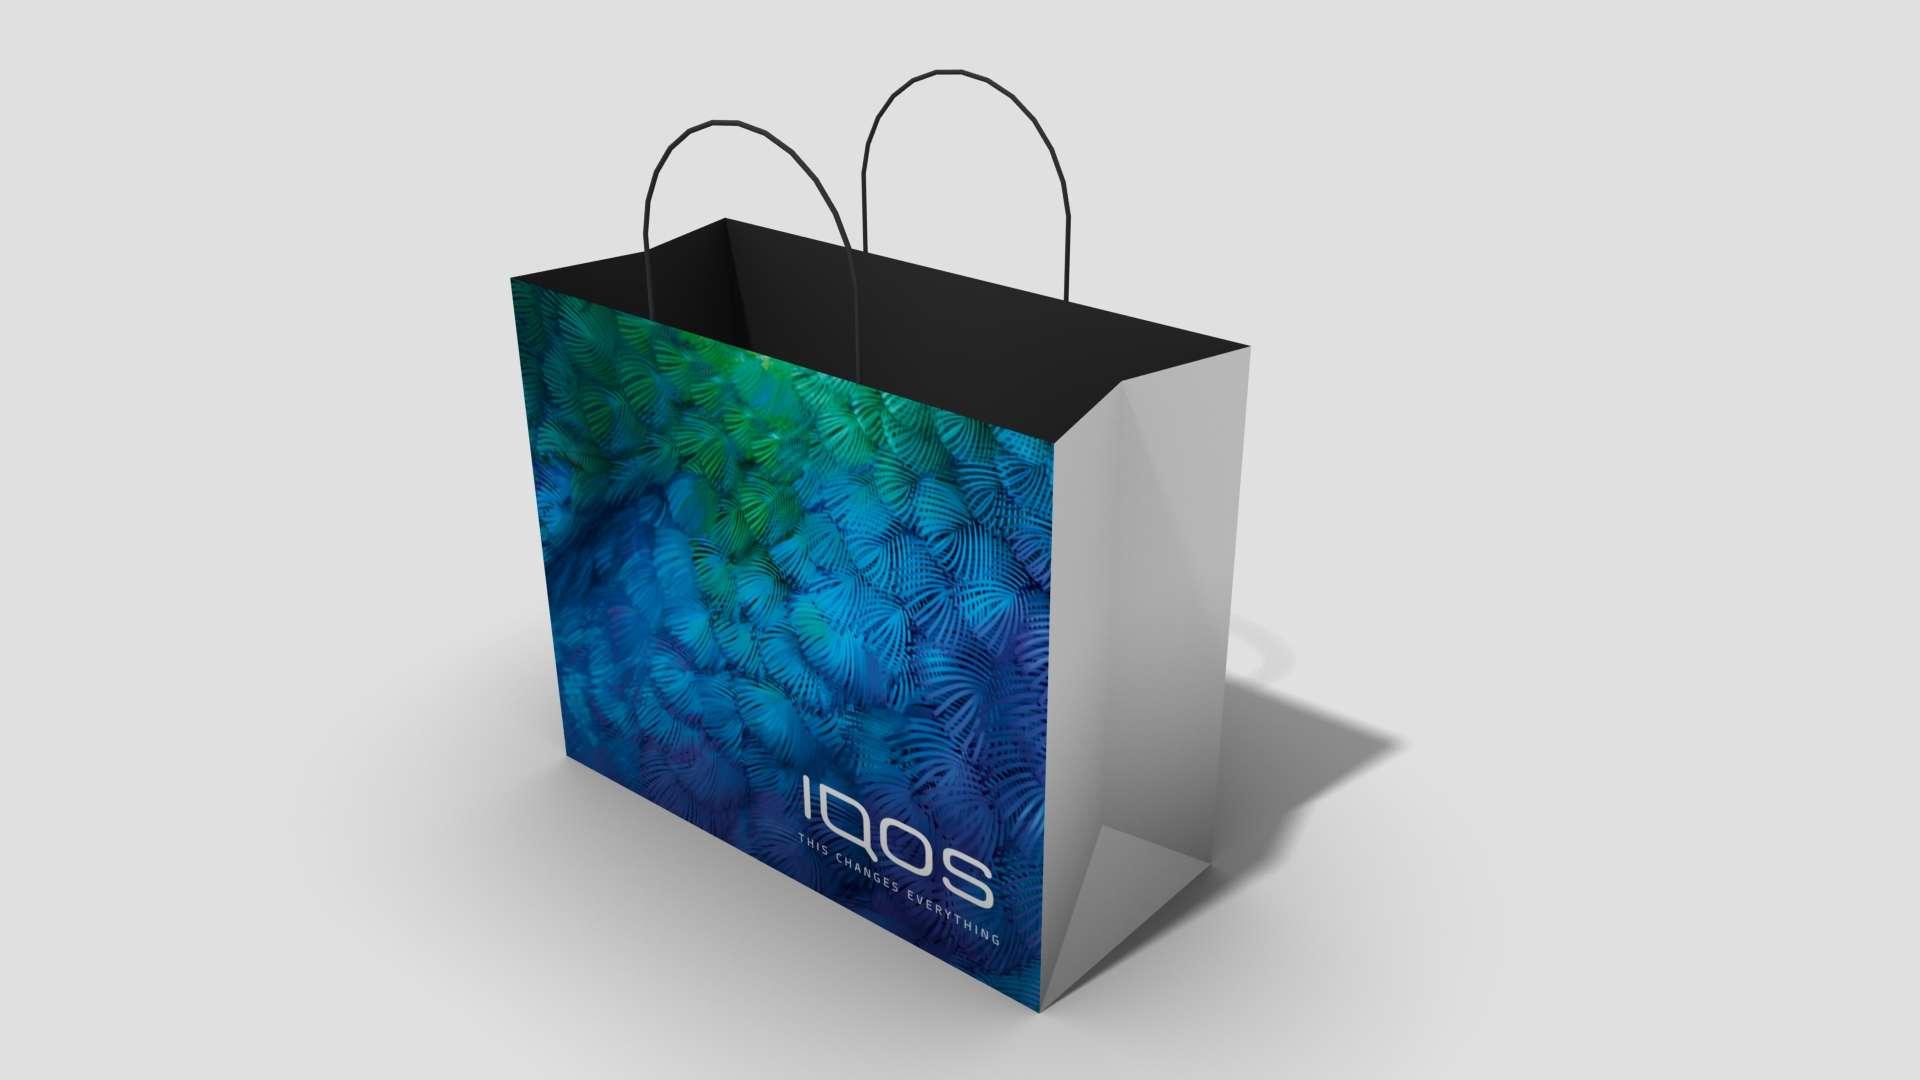 IQOS-paperbag-03